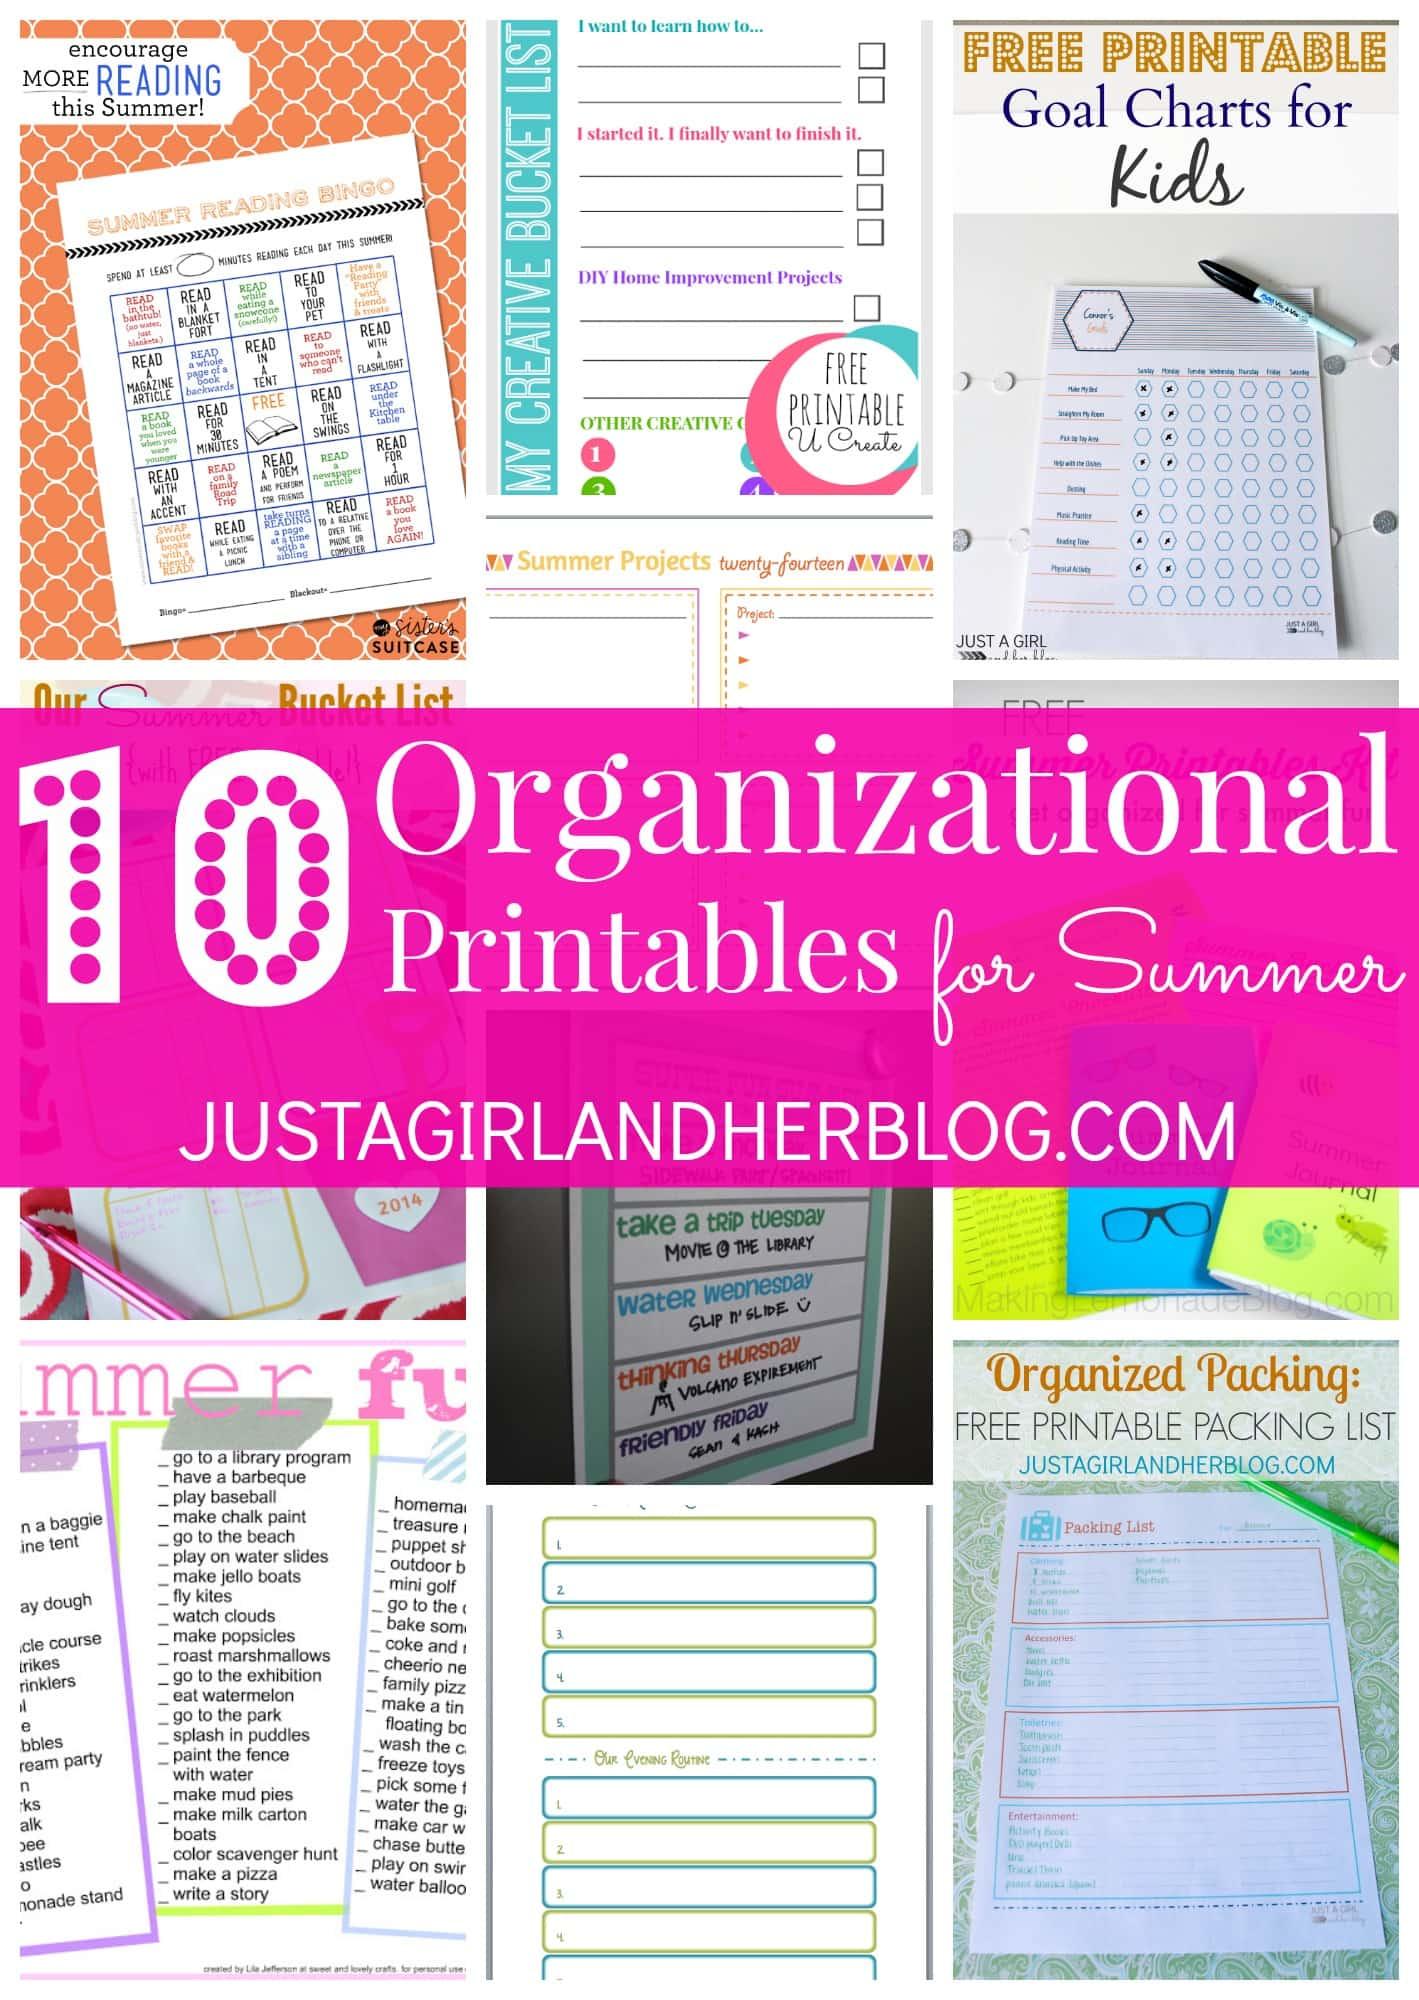 10 Organizational Printables For Summer